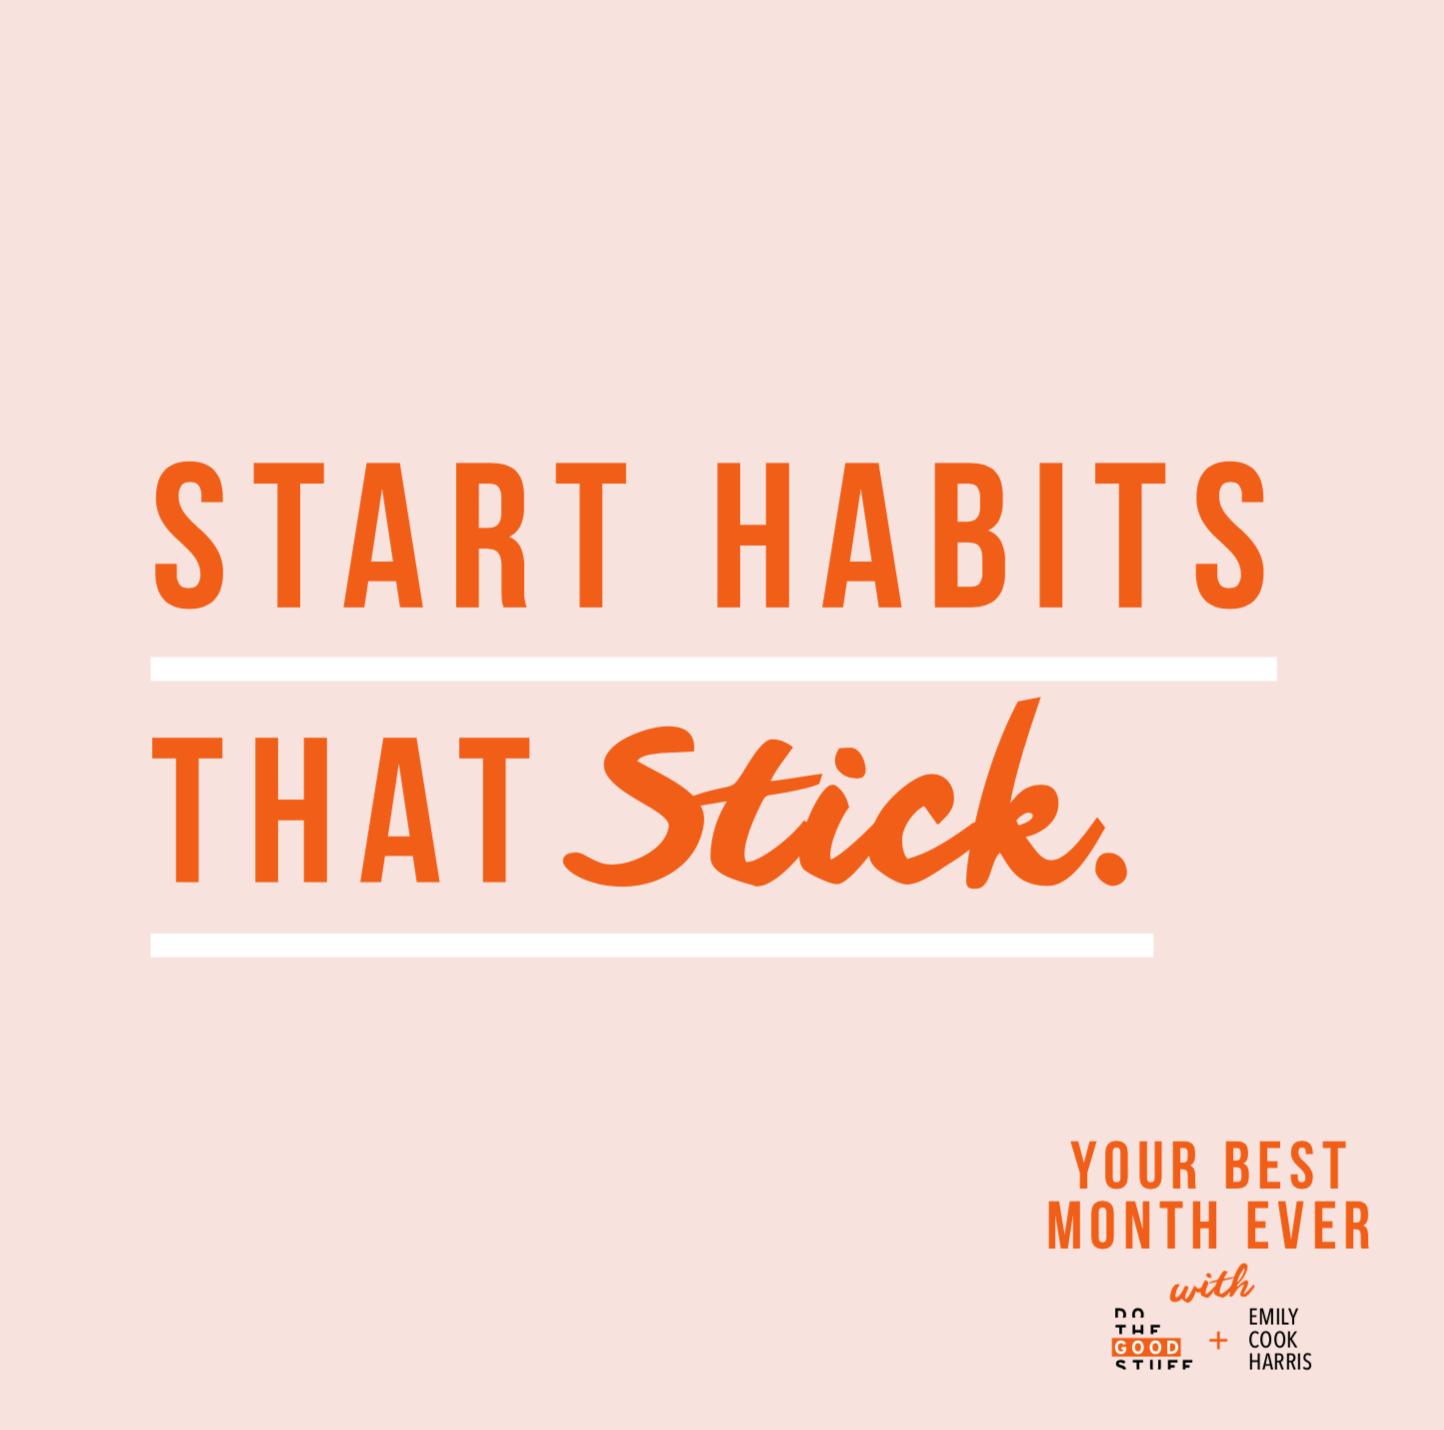 Start habits that stick.